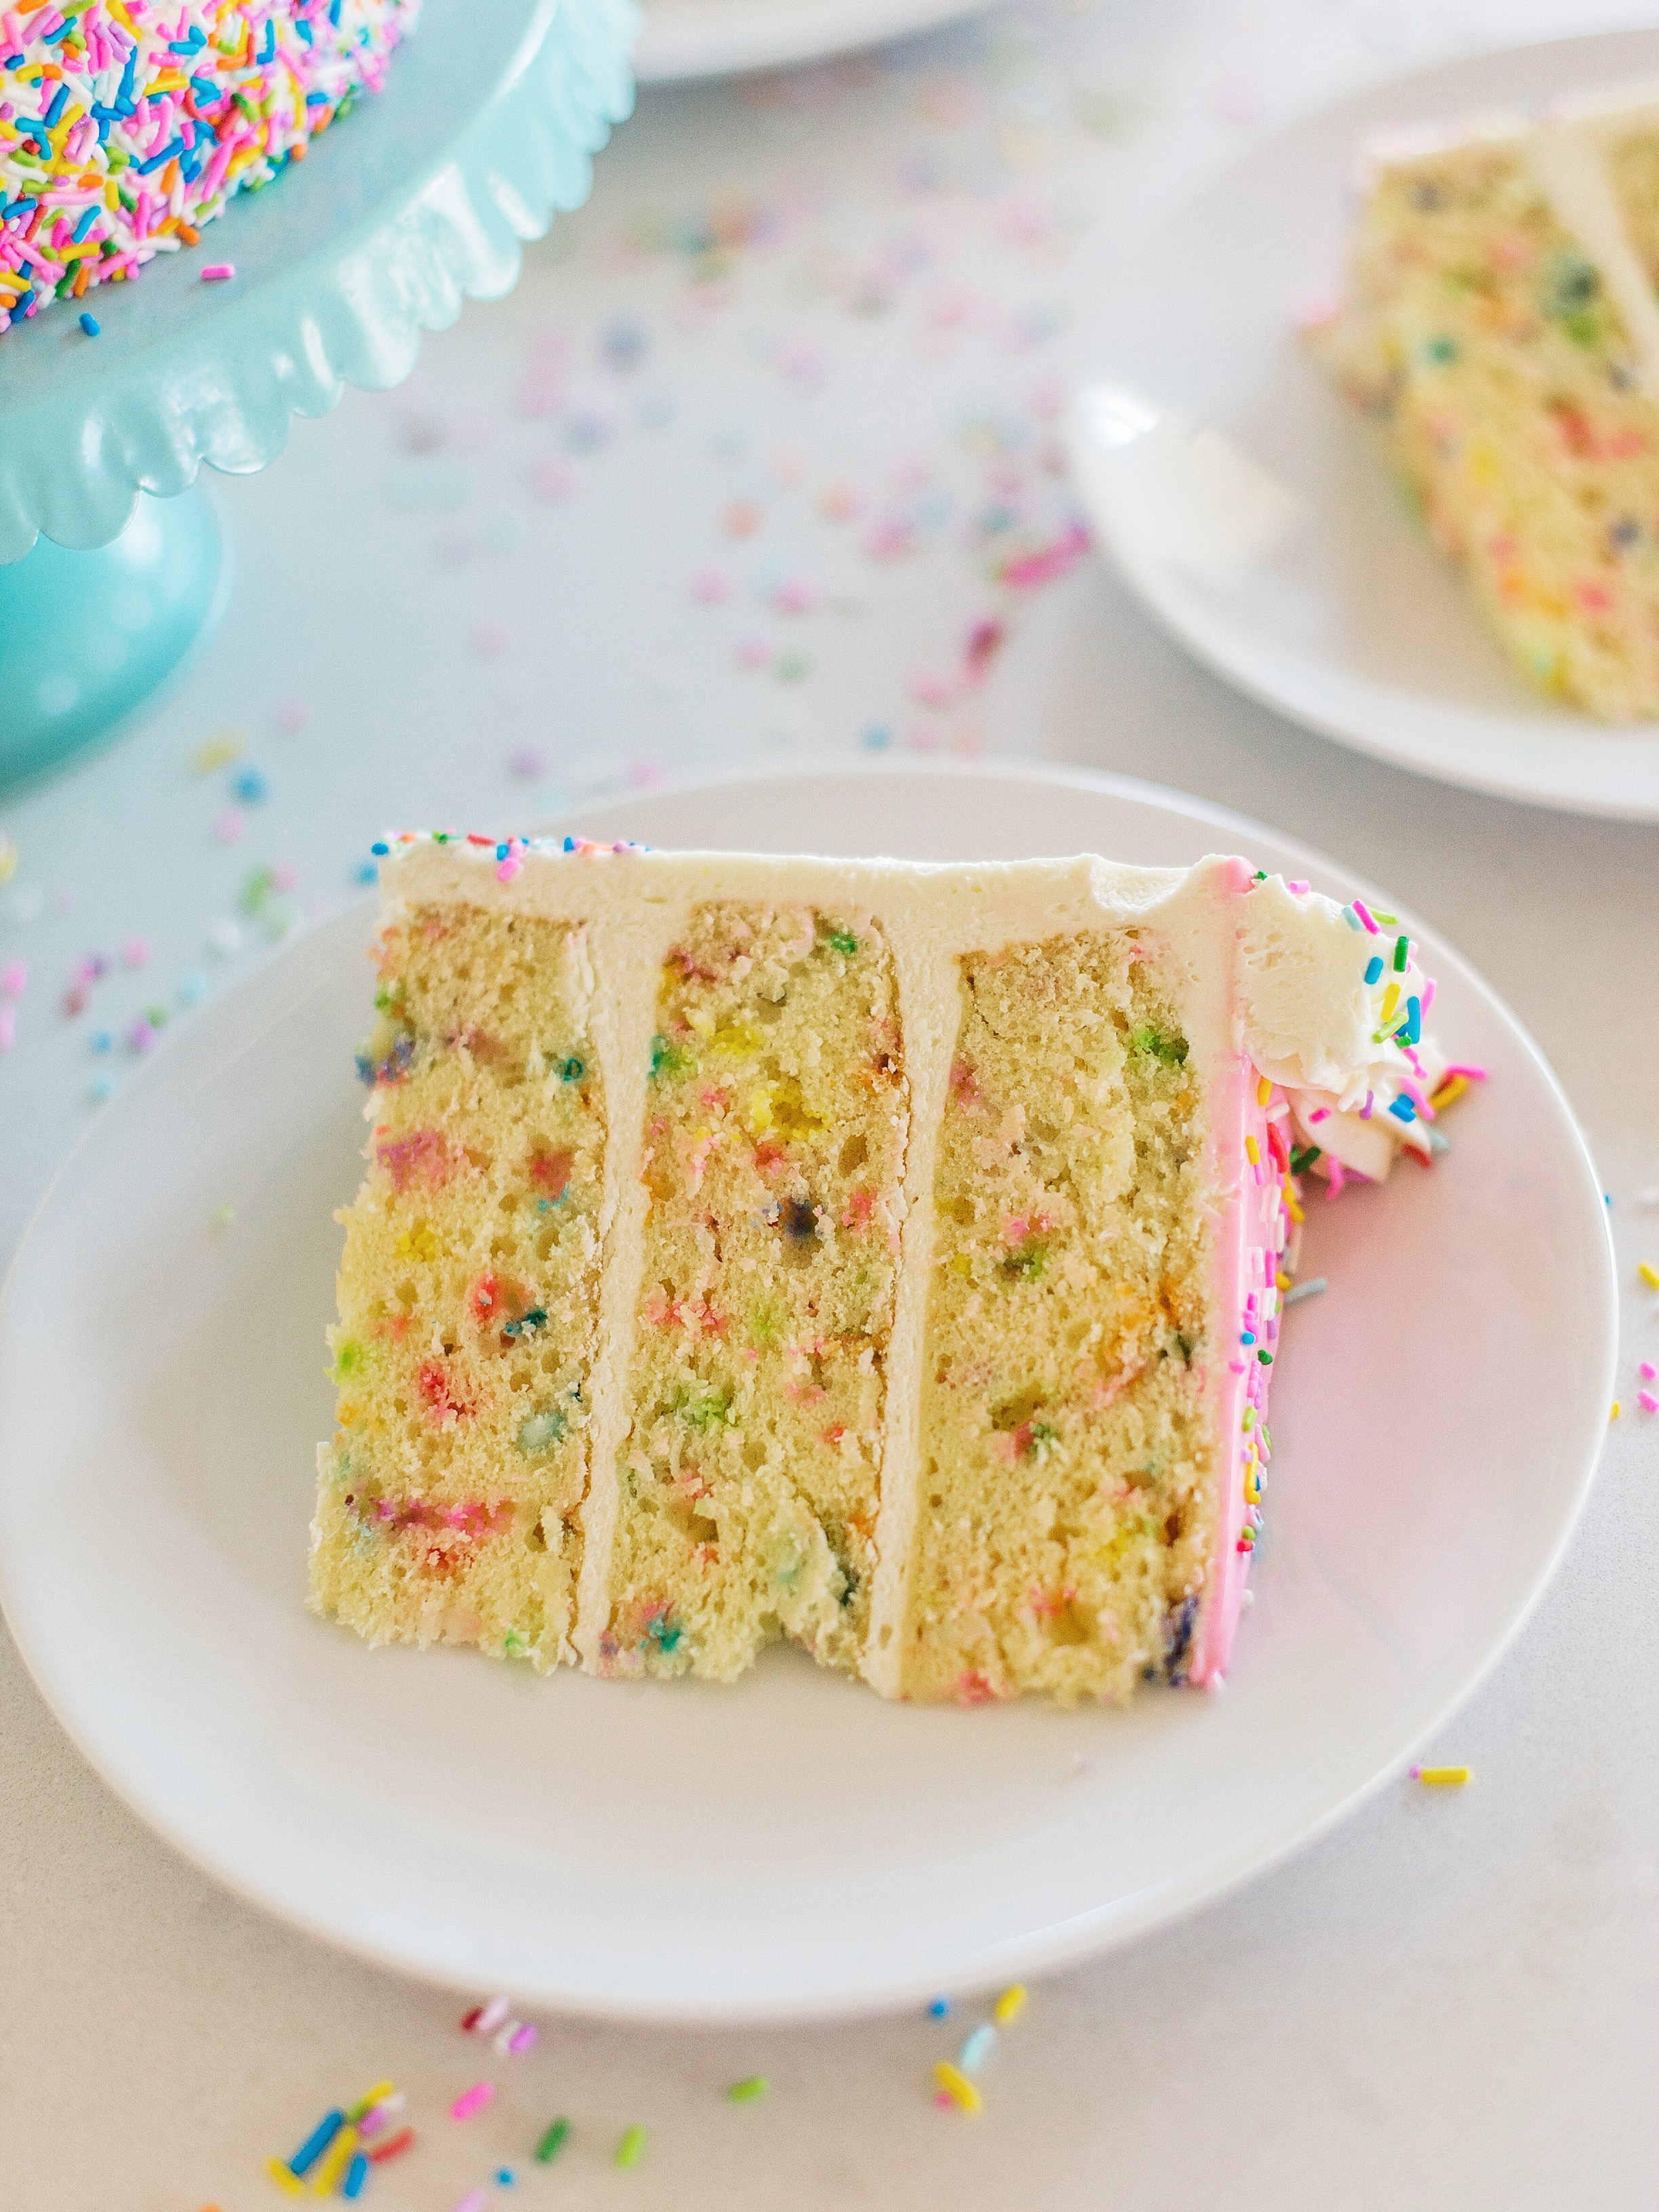 Moist and fluffy vanilla cake cakebycourtney.com